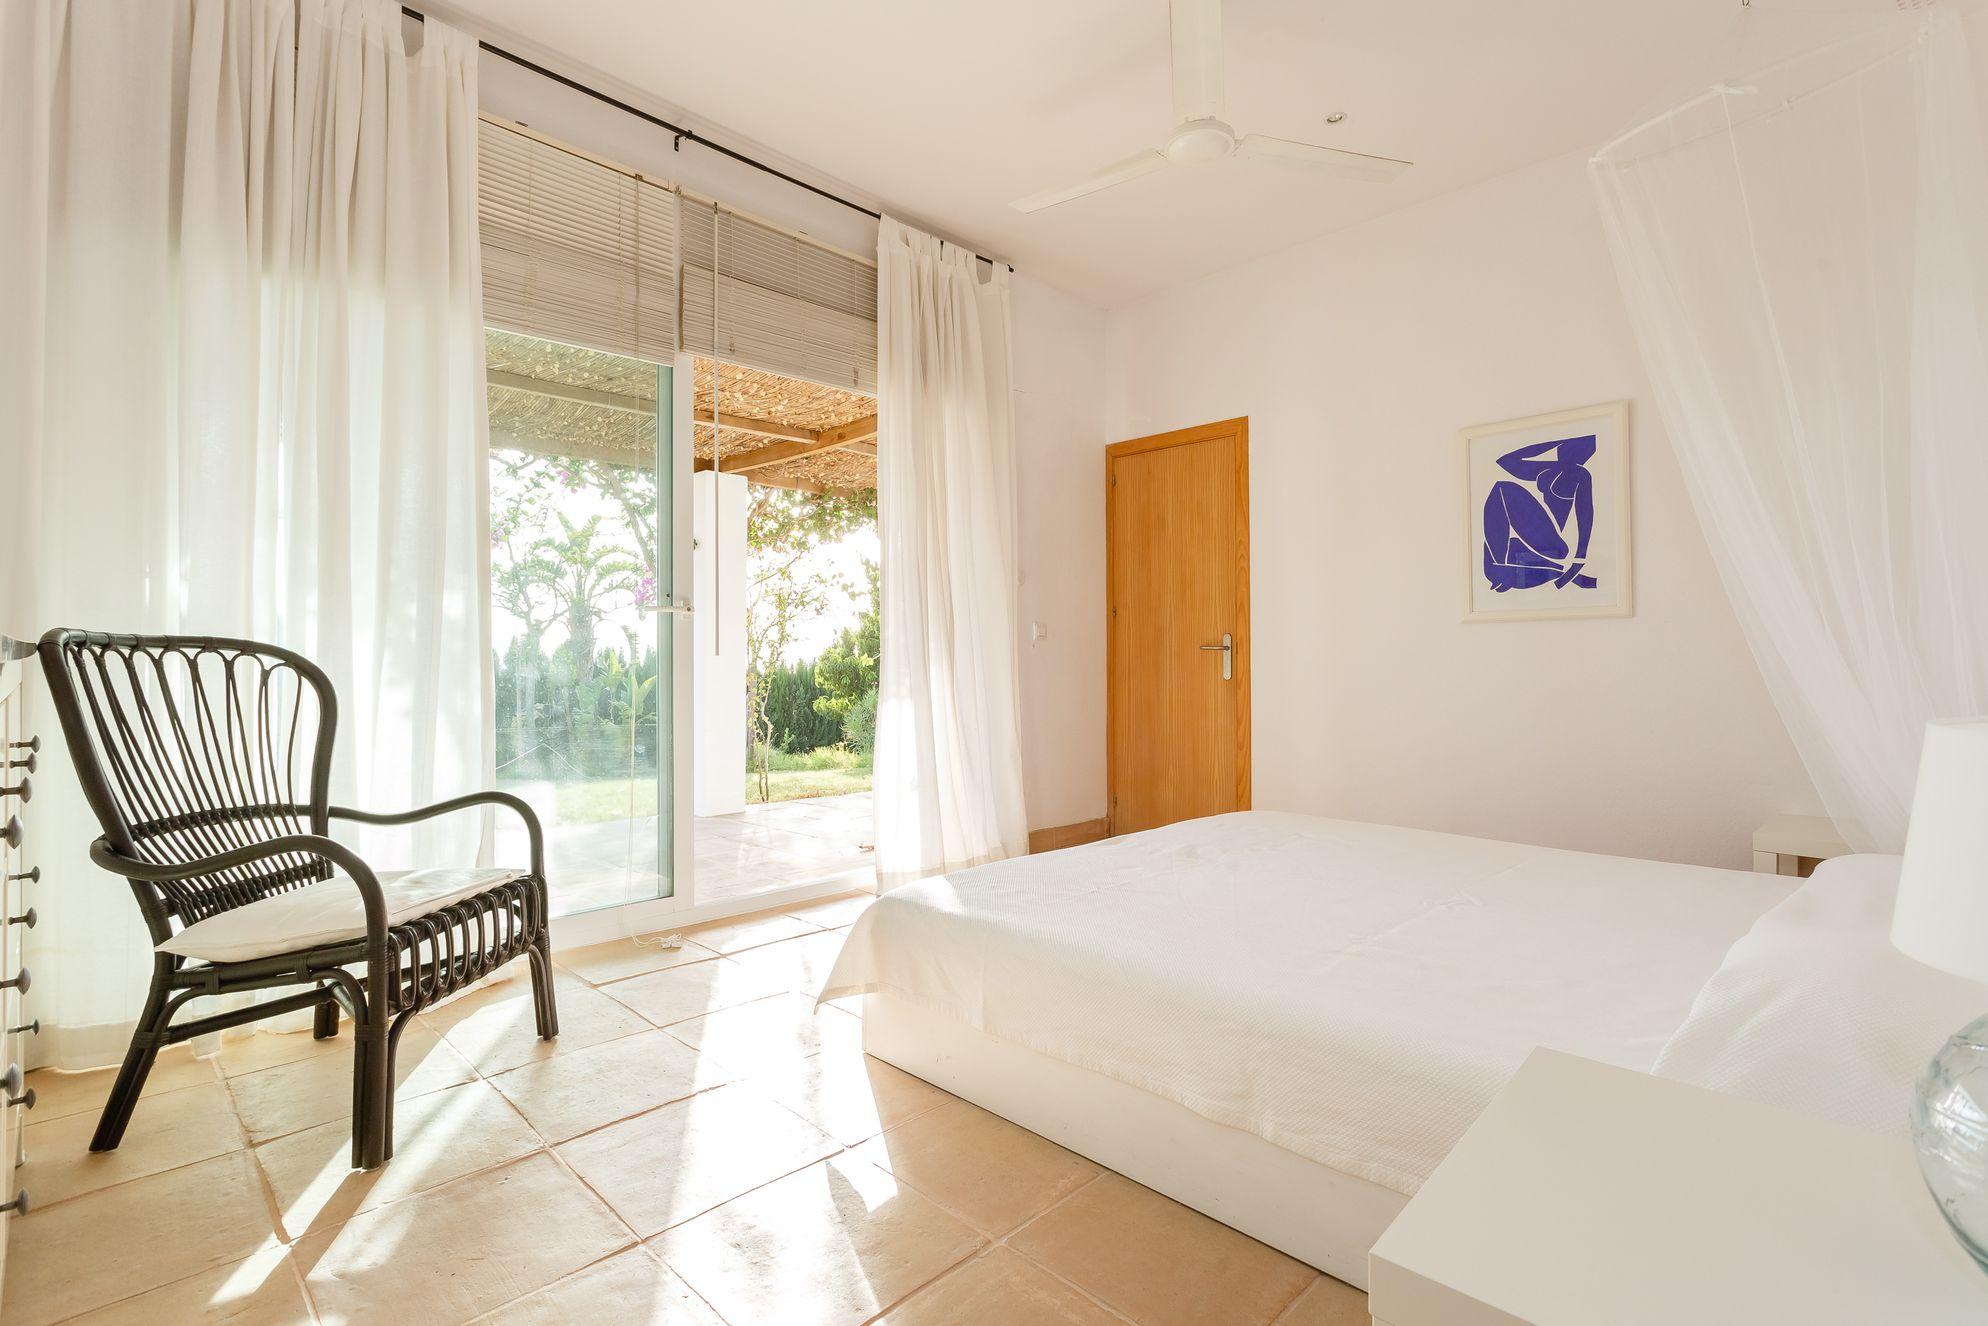 Simple, light-filled bedroom in El Martinete